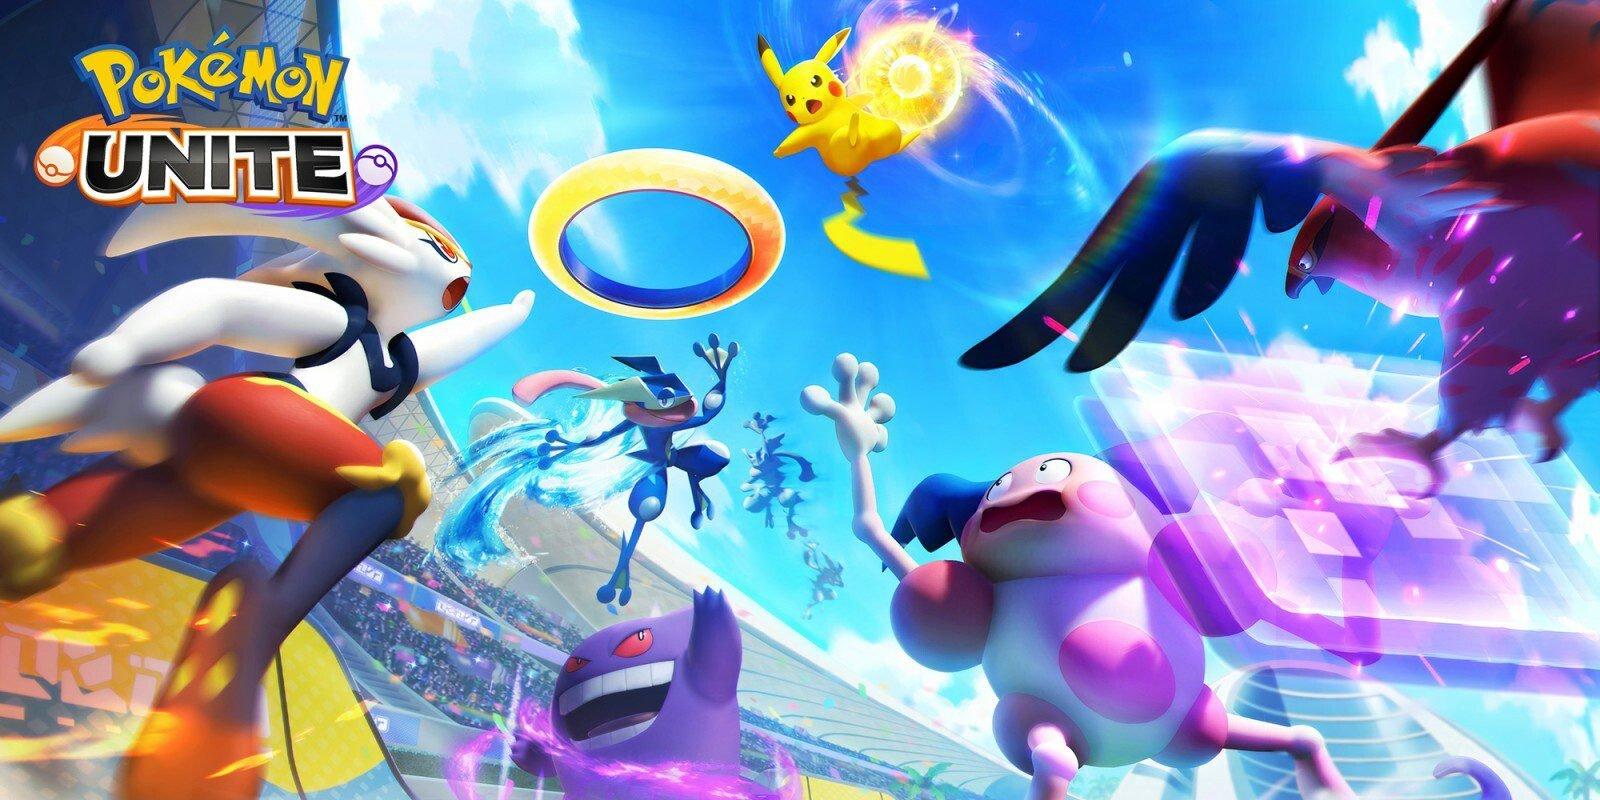 Pokemon Unite Update 1.2